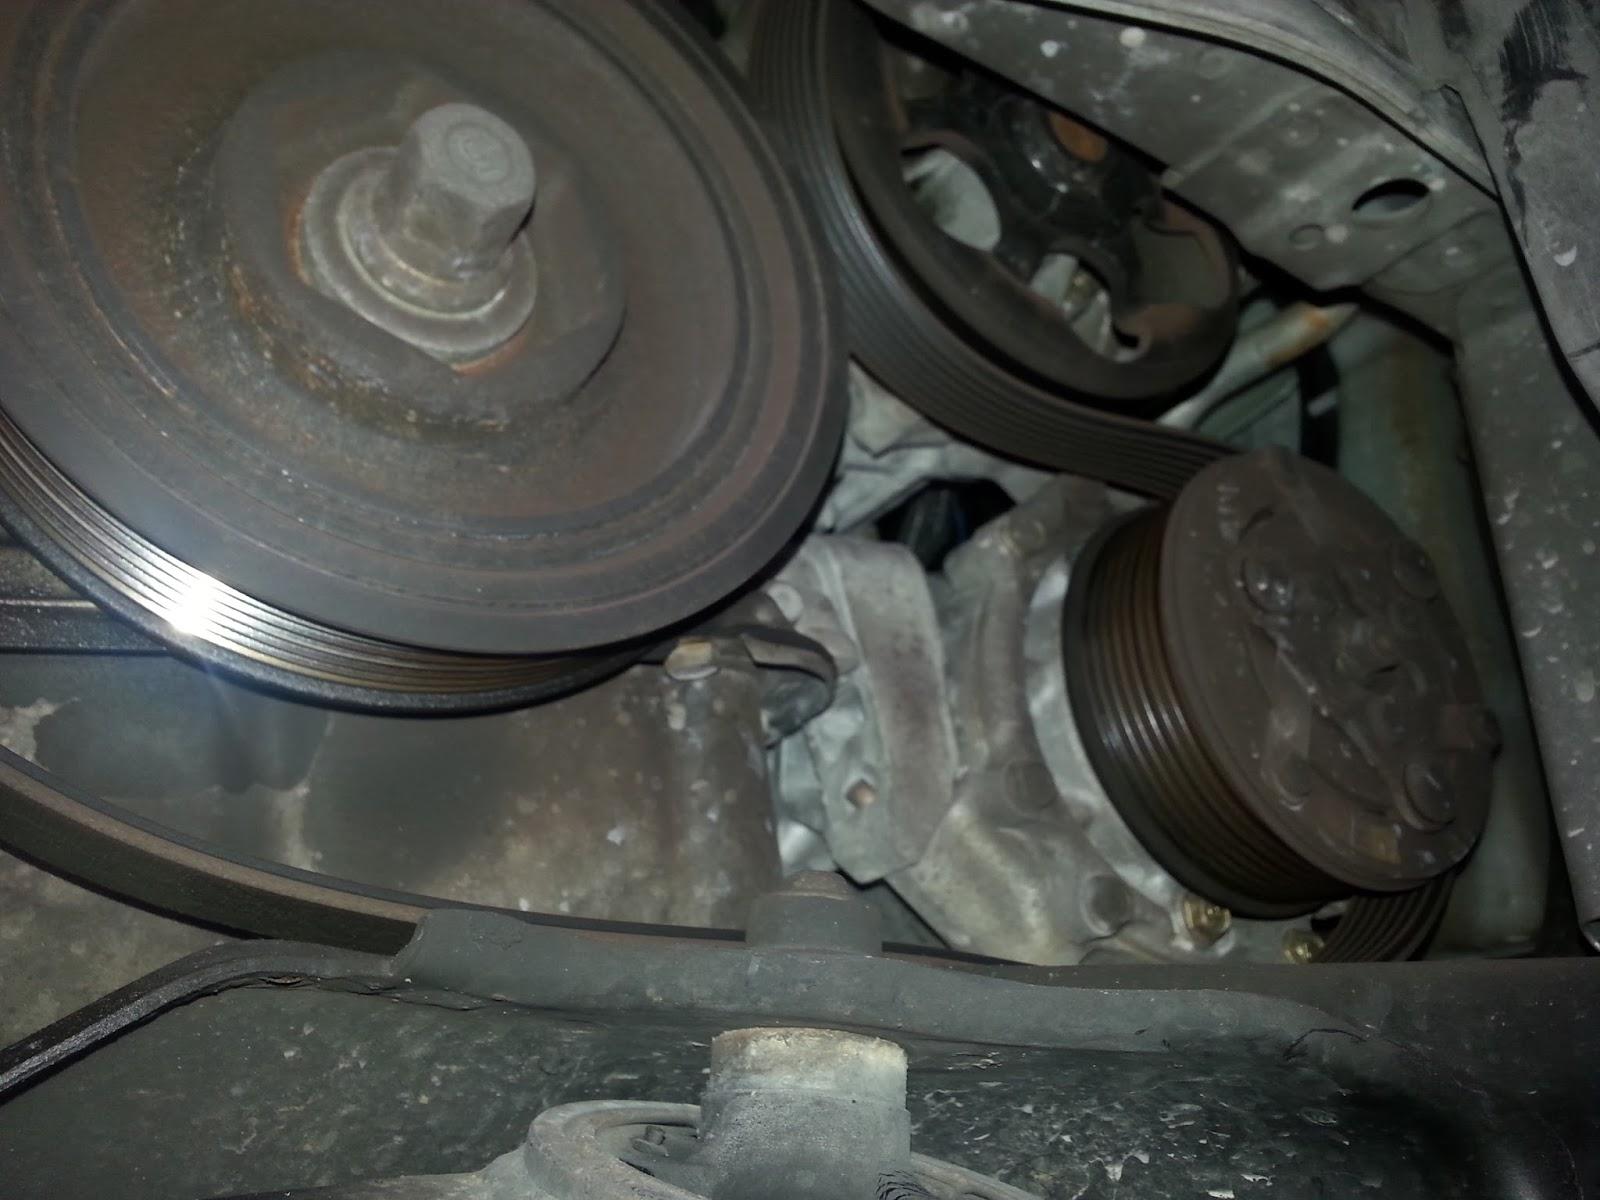 Corolla DIY: DIY - Serpentine Belt 2000 Honda CRV